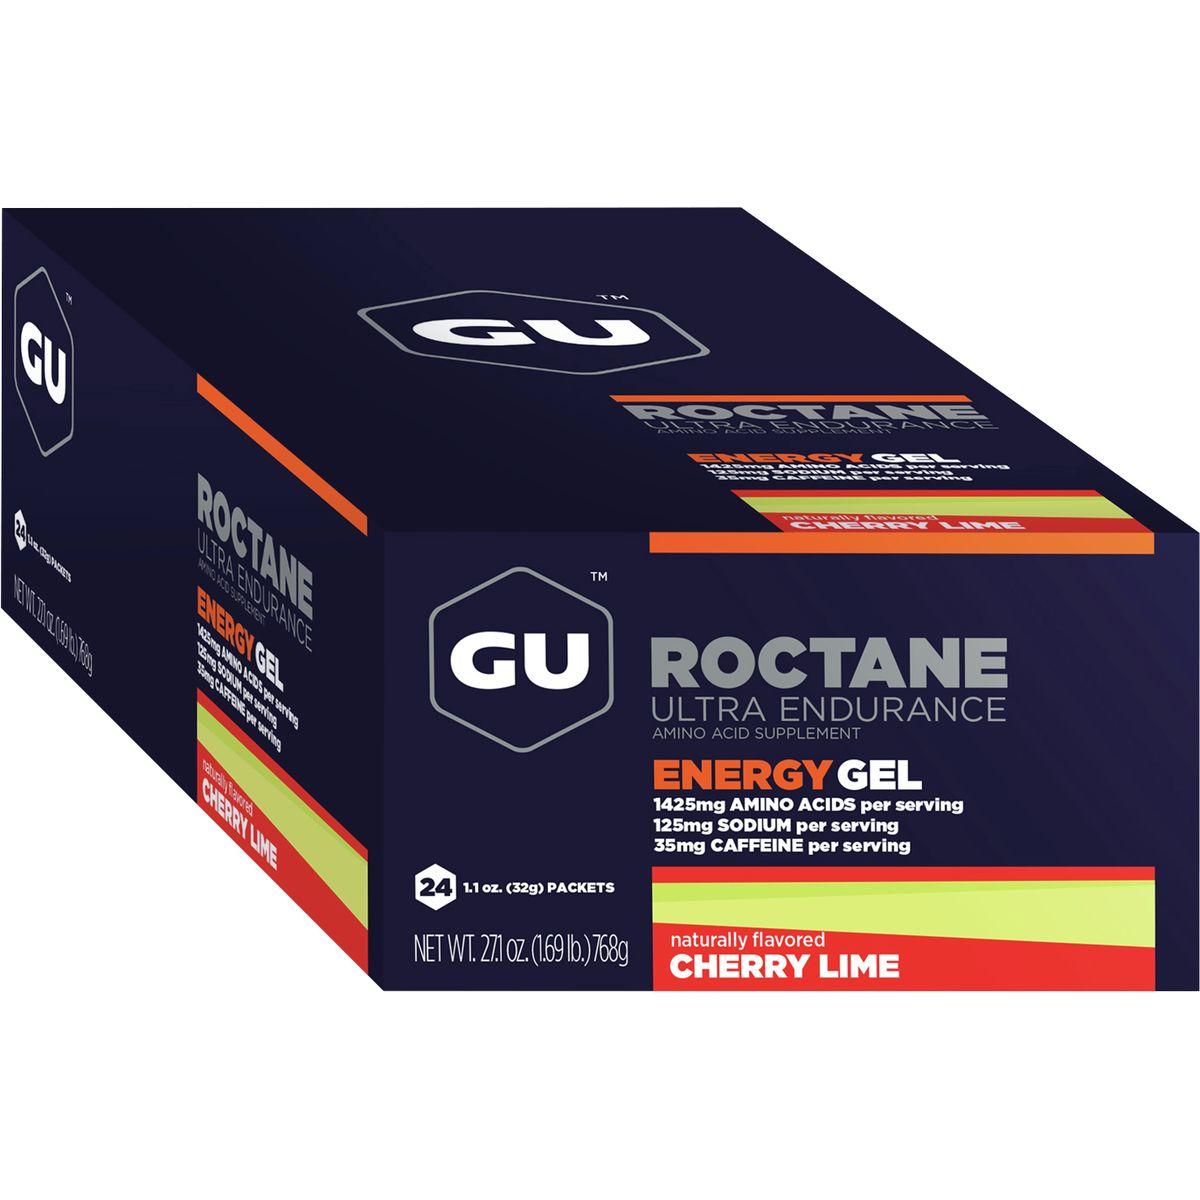 GU Roctane Ultra Endurance Energy Gel